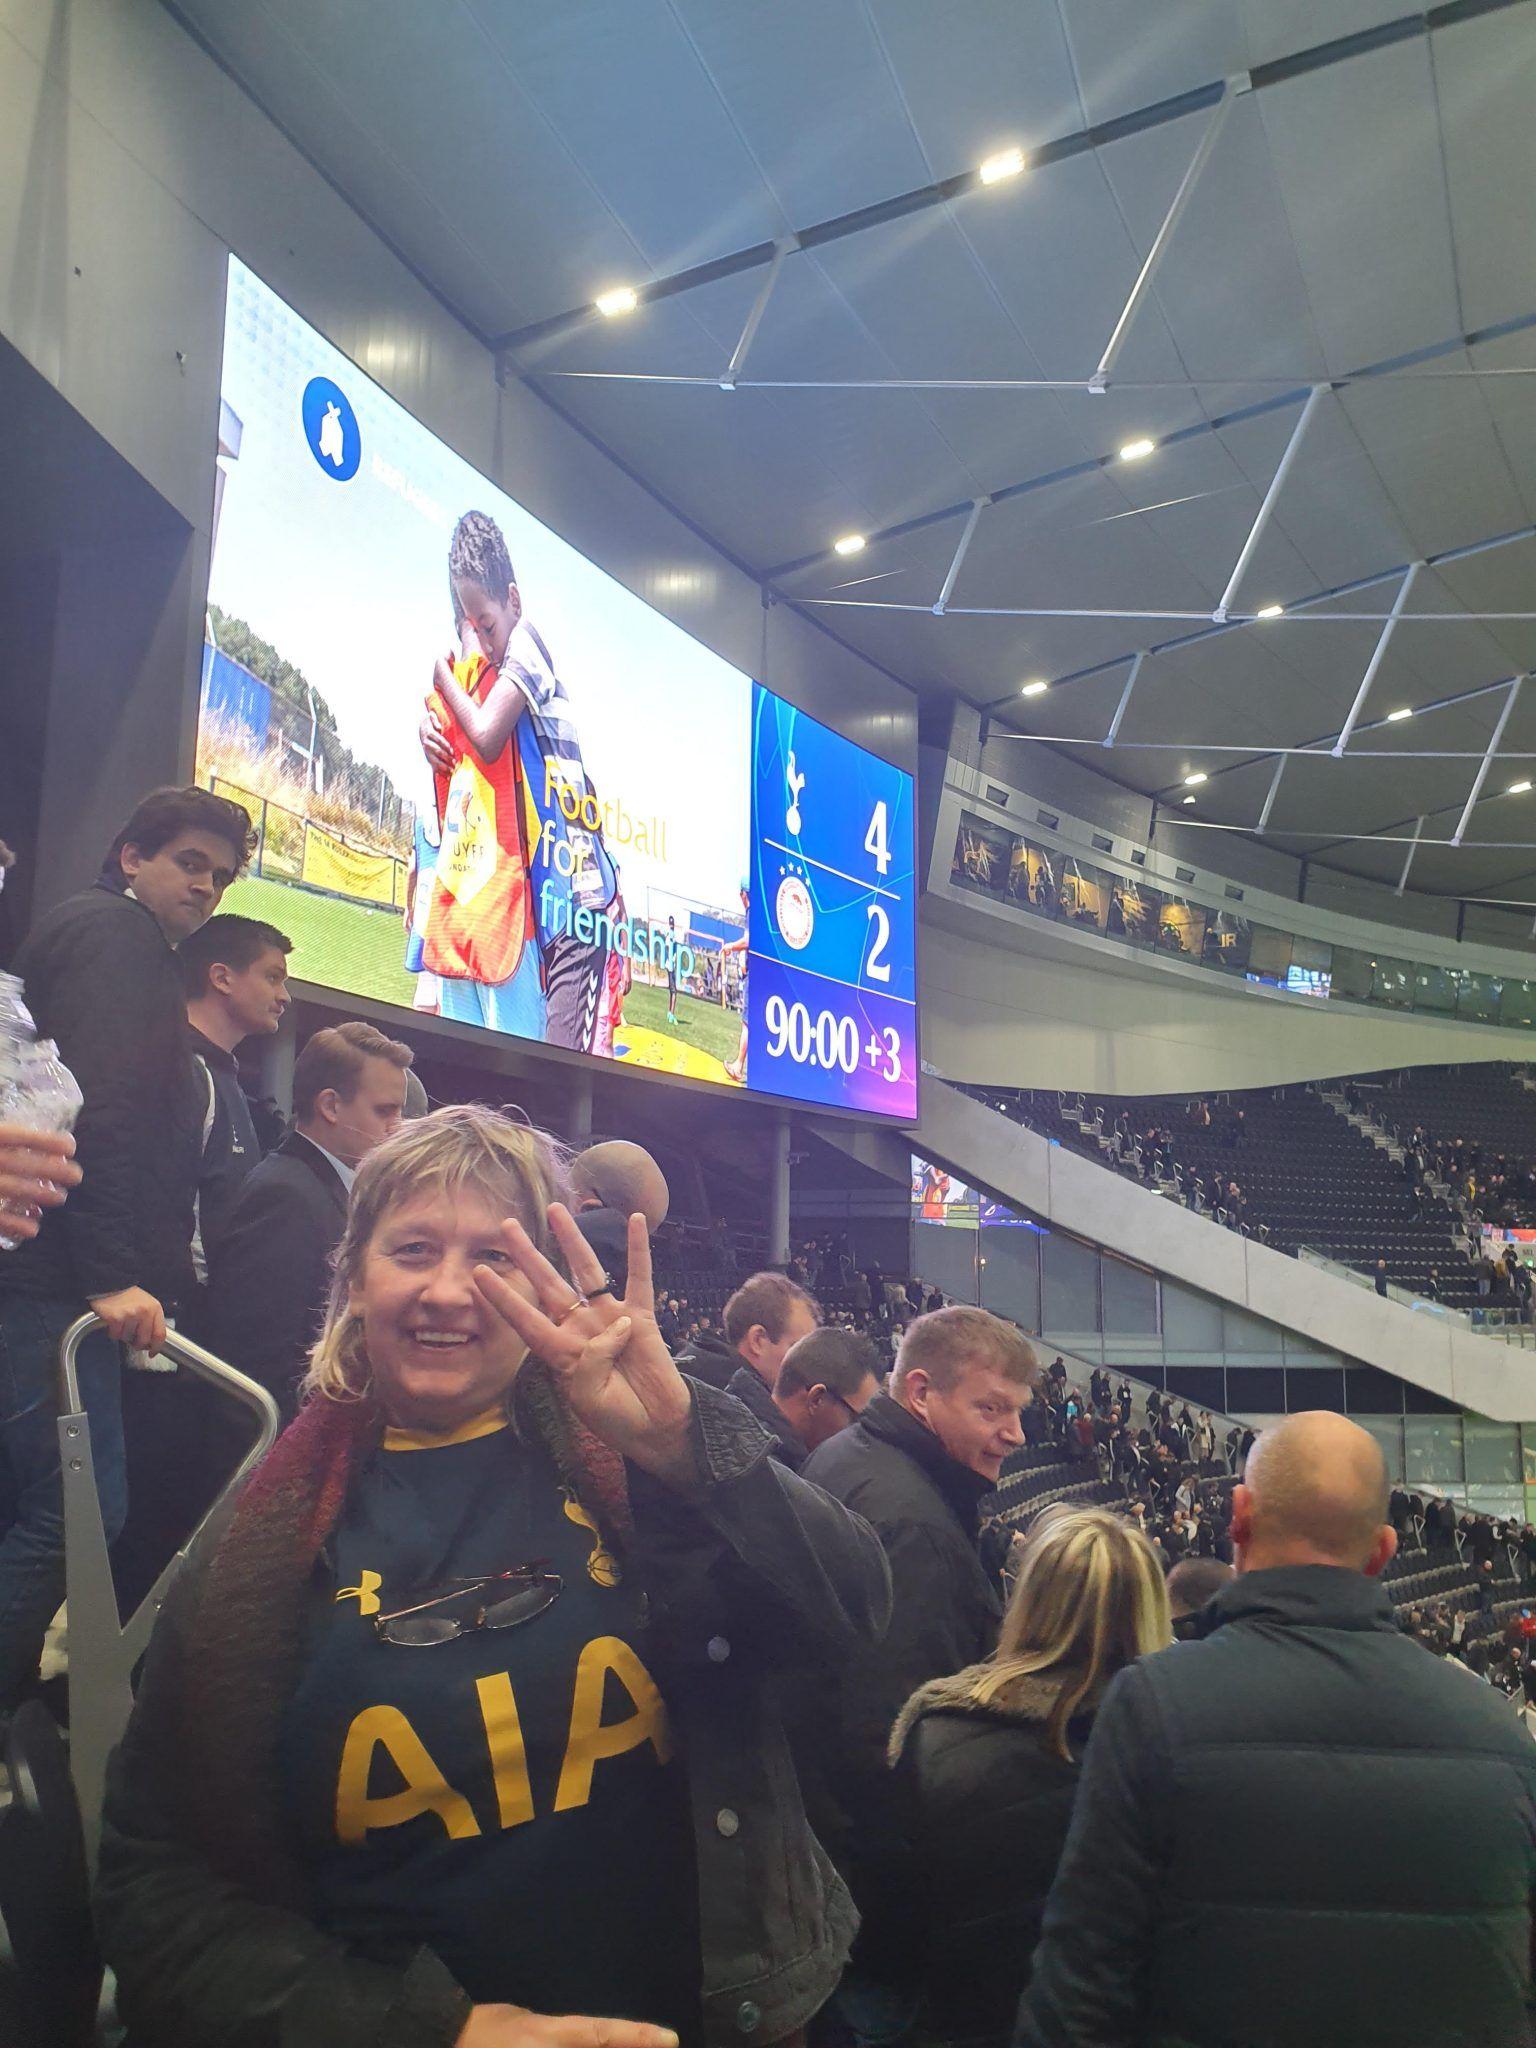 Helen celebrates the win